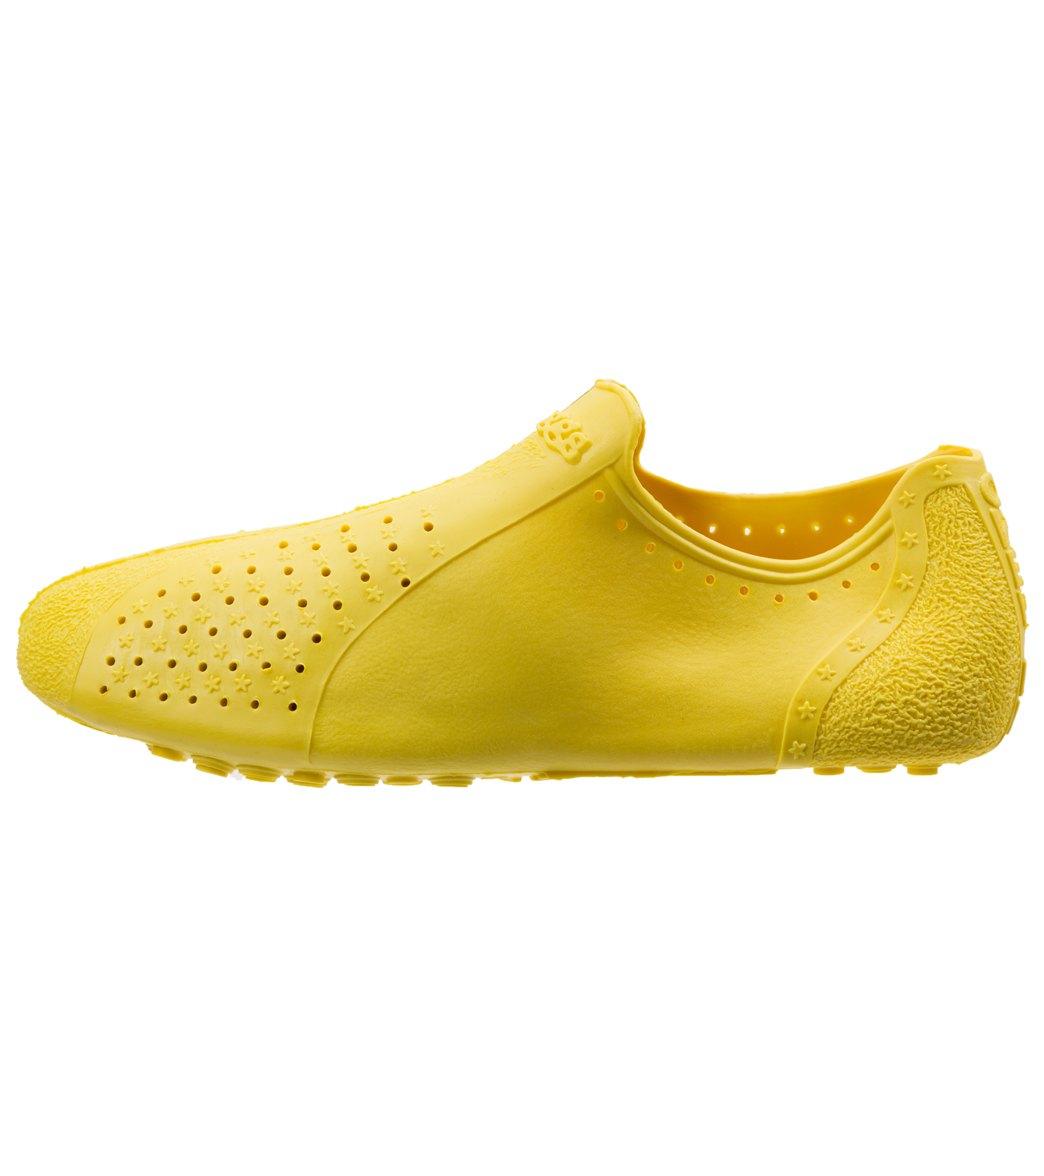 Okespor Froggs Water Shoes at SwimOutlet.com